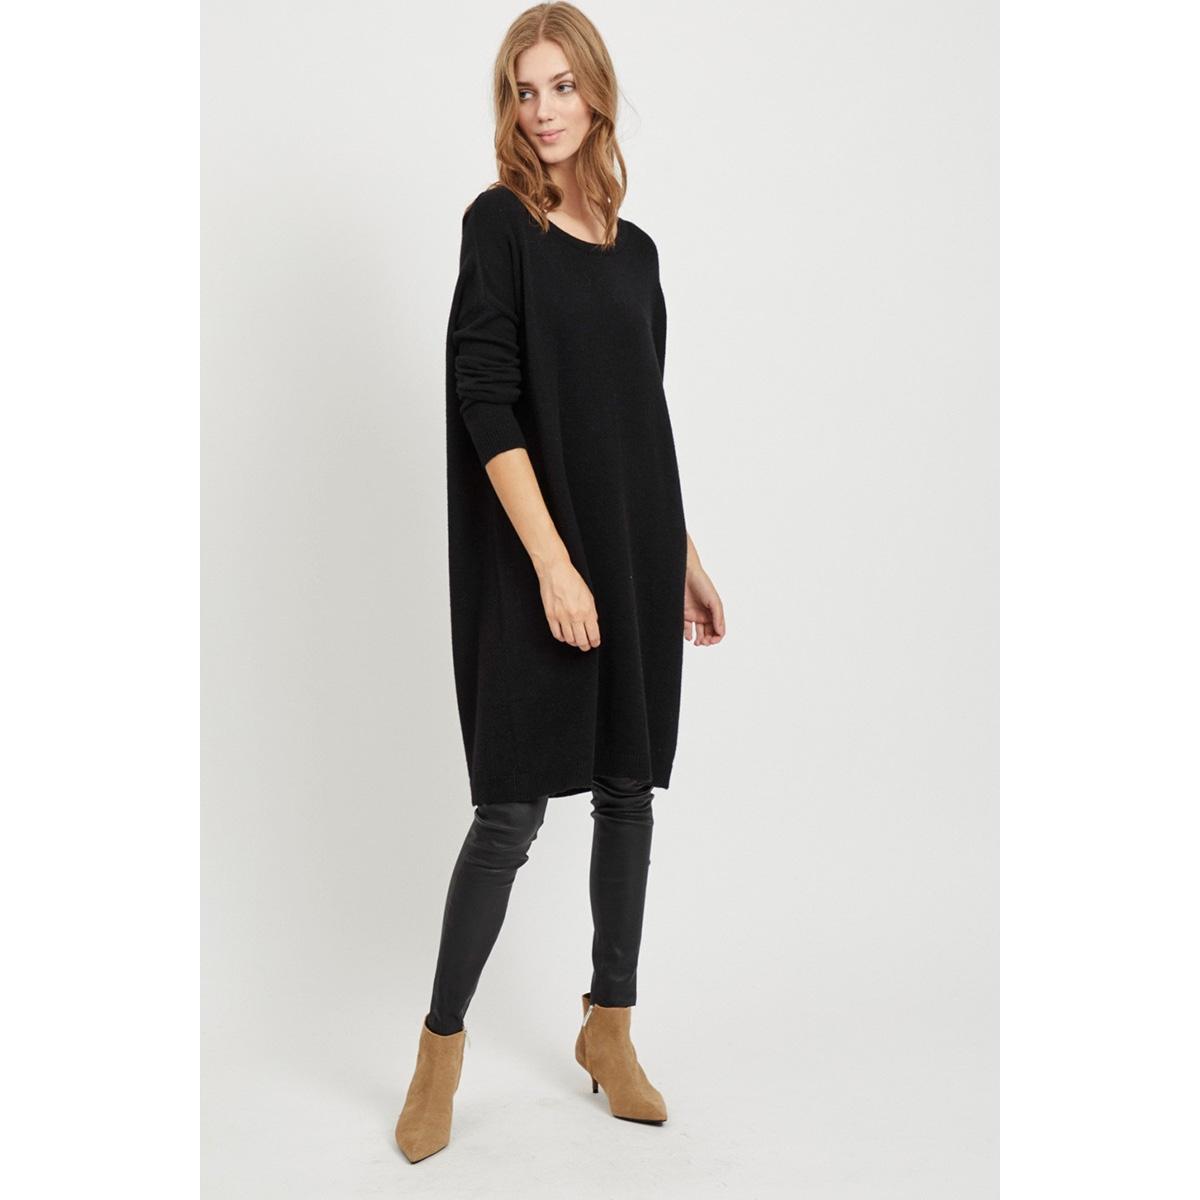 viril l/s knit tunic-fav nx 14055882 vila tuniek black